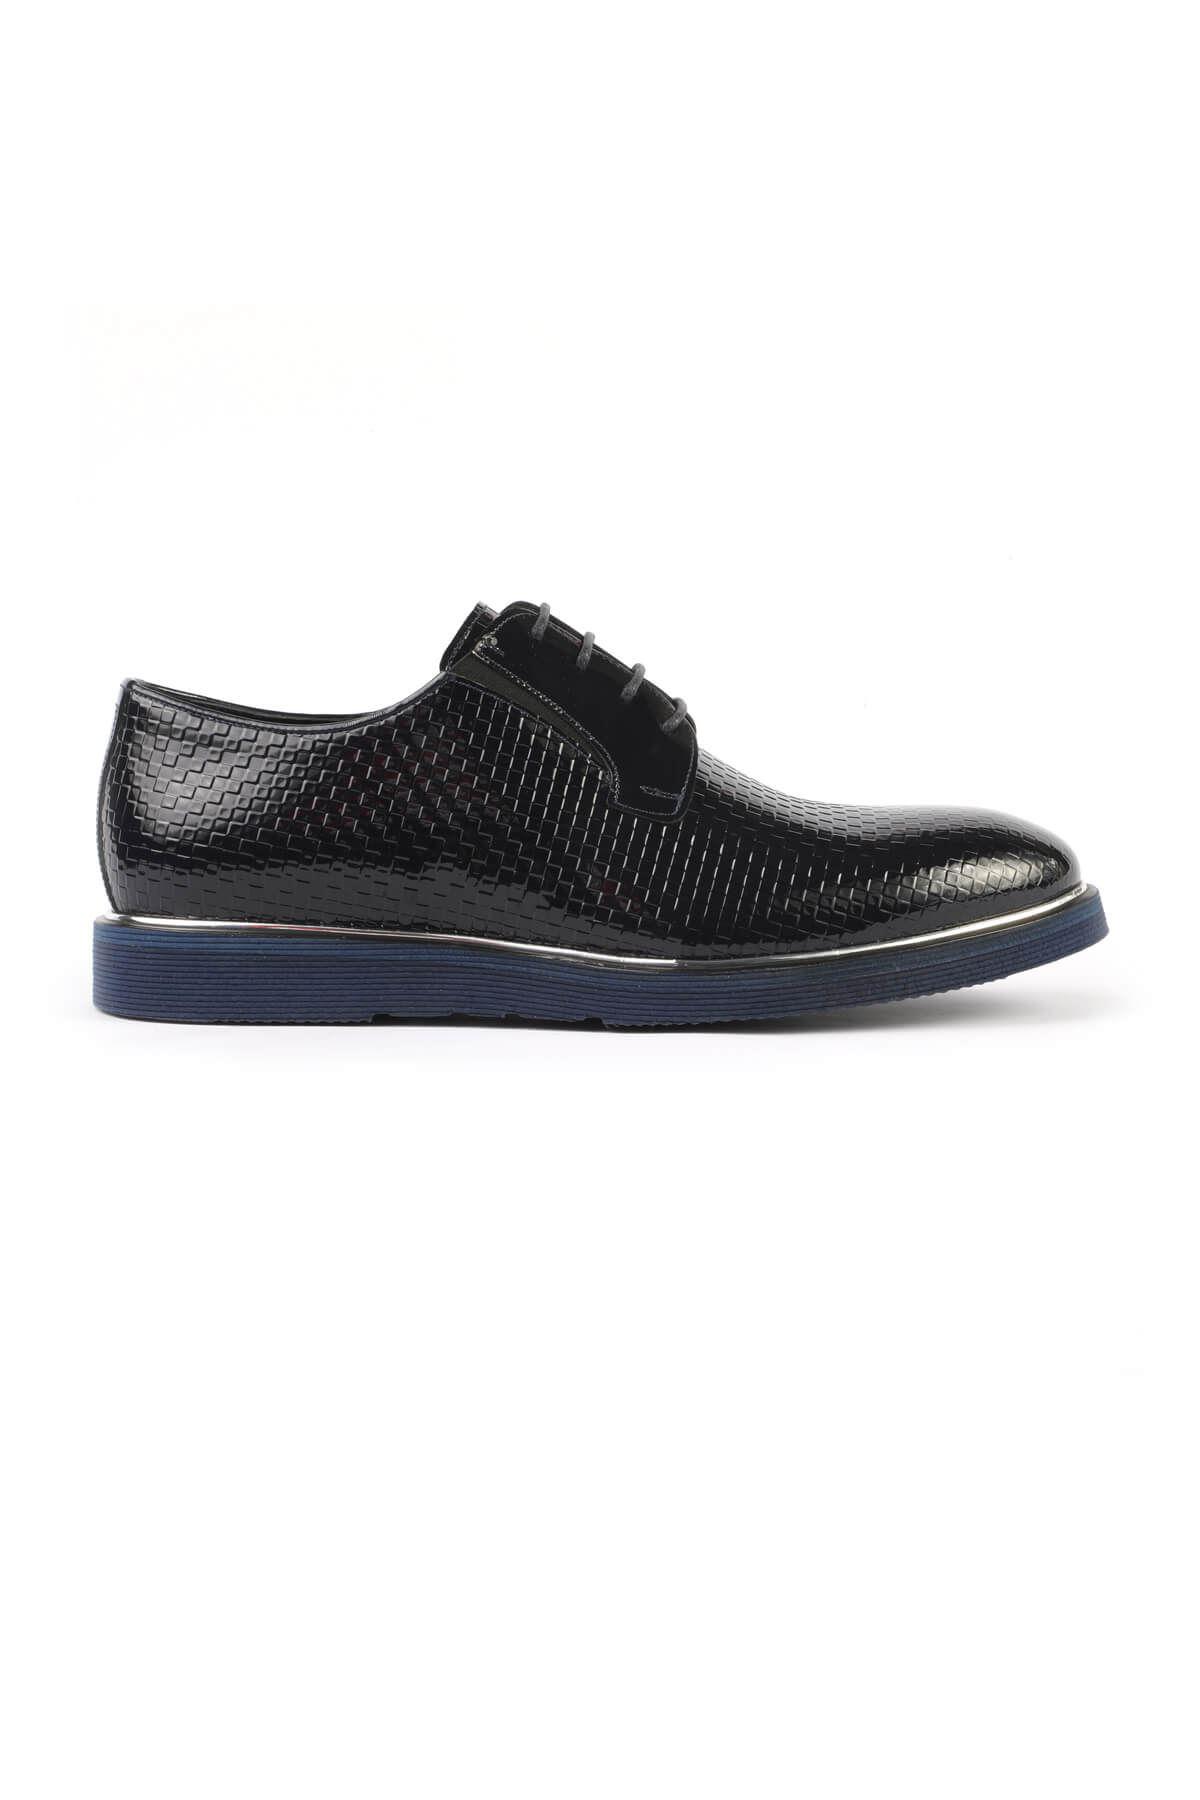 Libero 2700 Navy Blue Casual Shoes